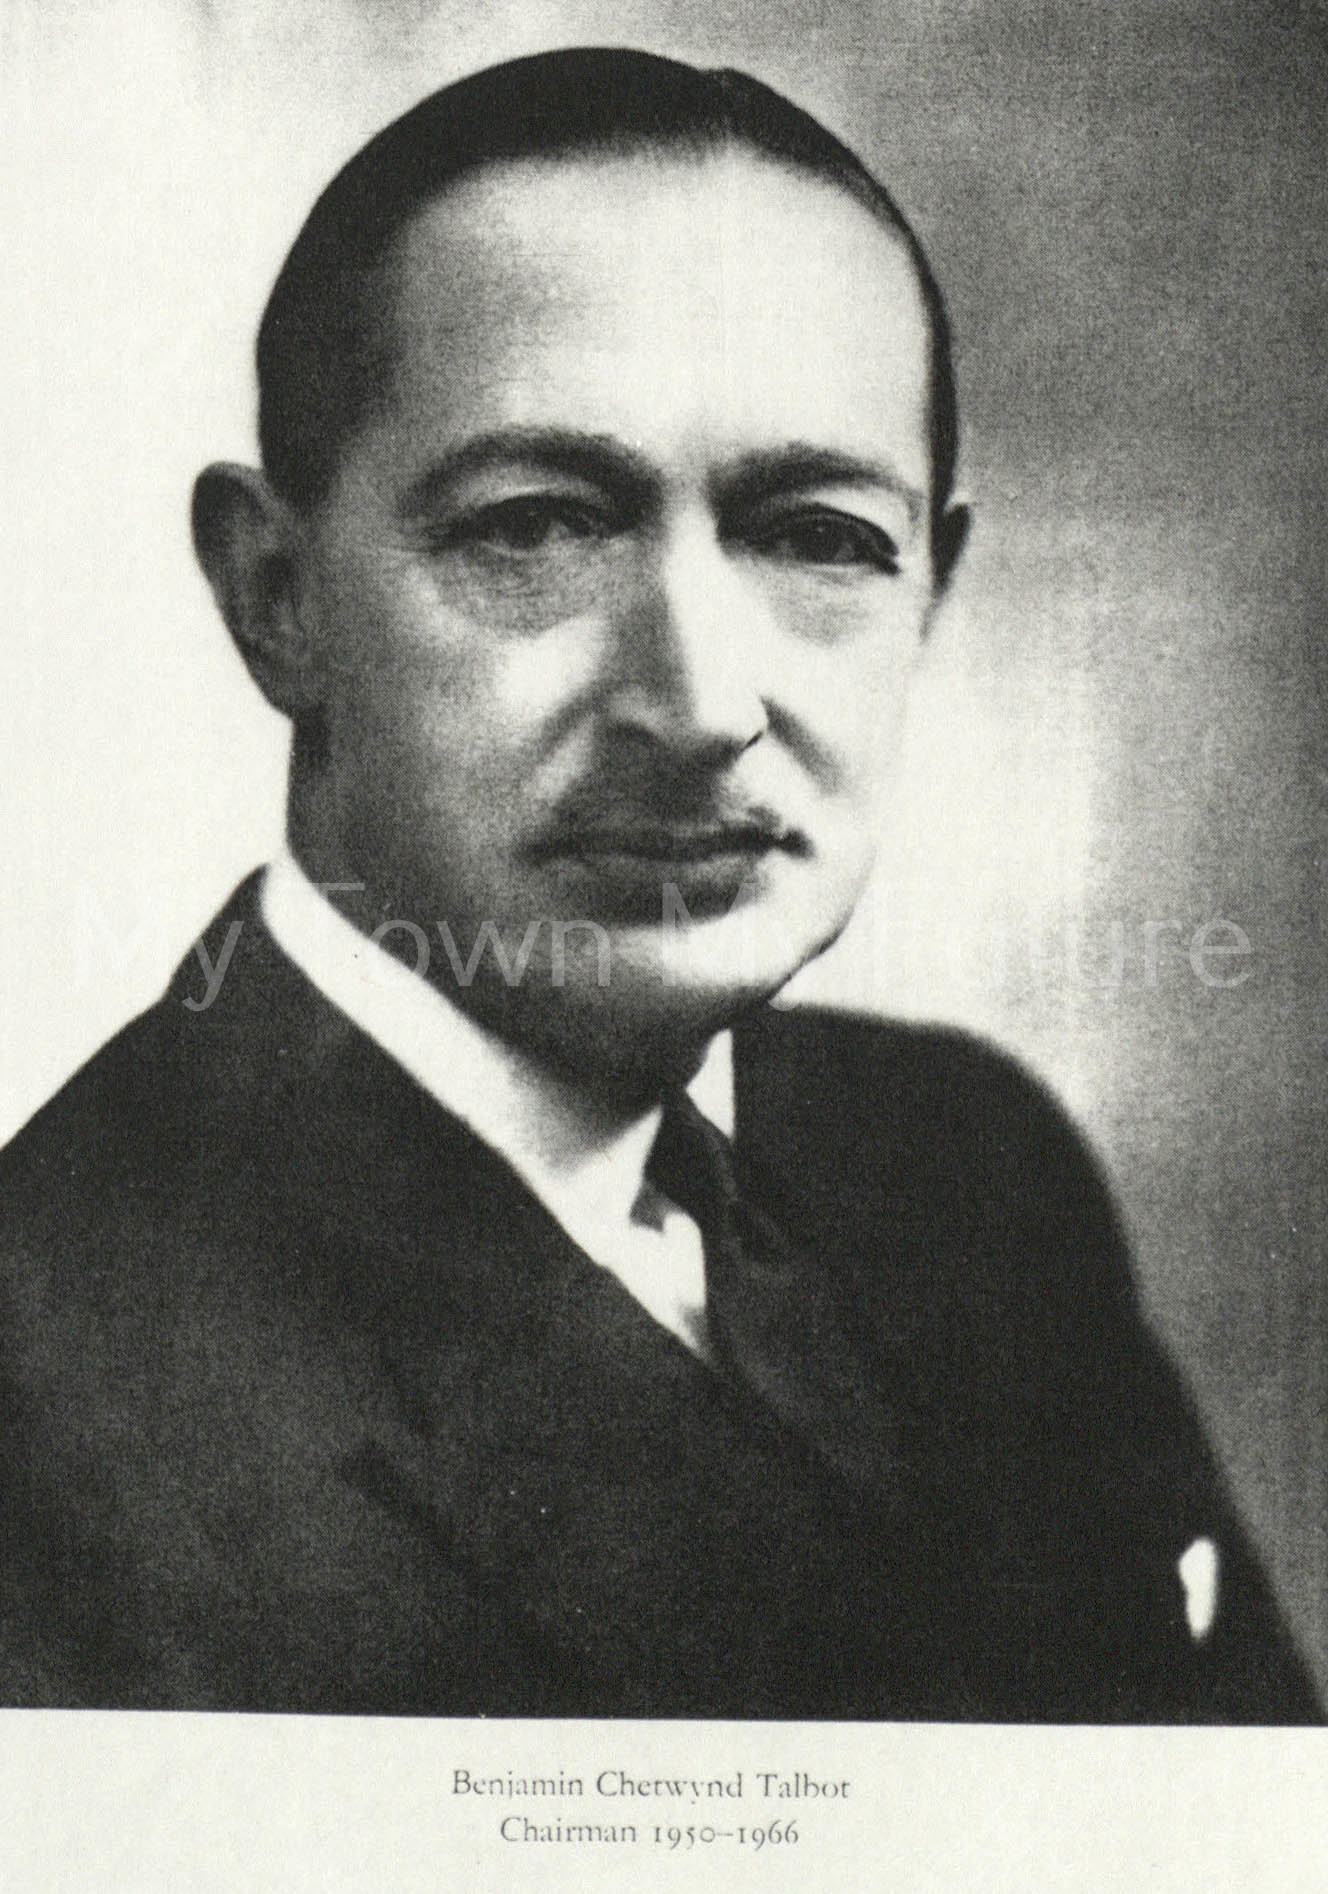 Benjamin Chetwynd Talbot - British Steel